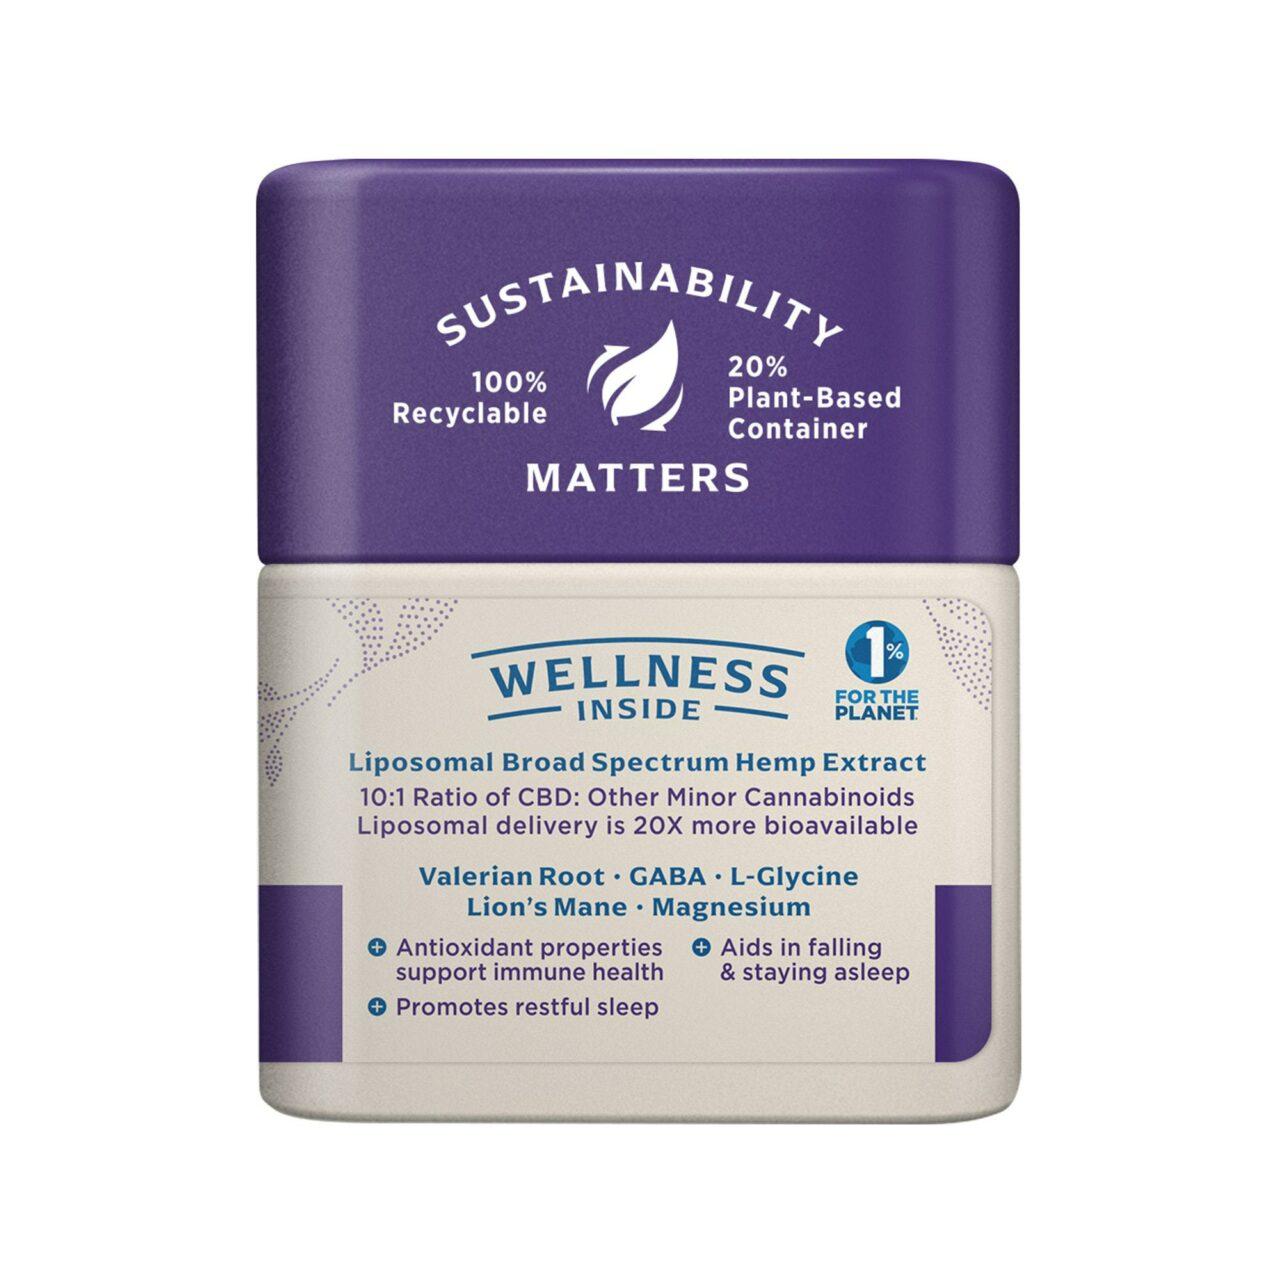 Medterra, Wellness CBD Capsules, Sleep Well, Broad Spectrum THC-Free, 30ct, 750mg CBD 2